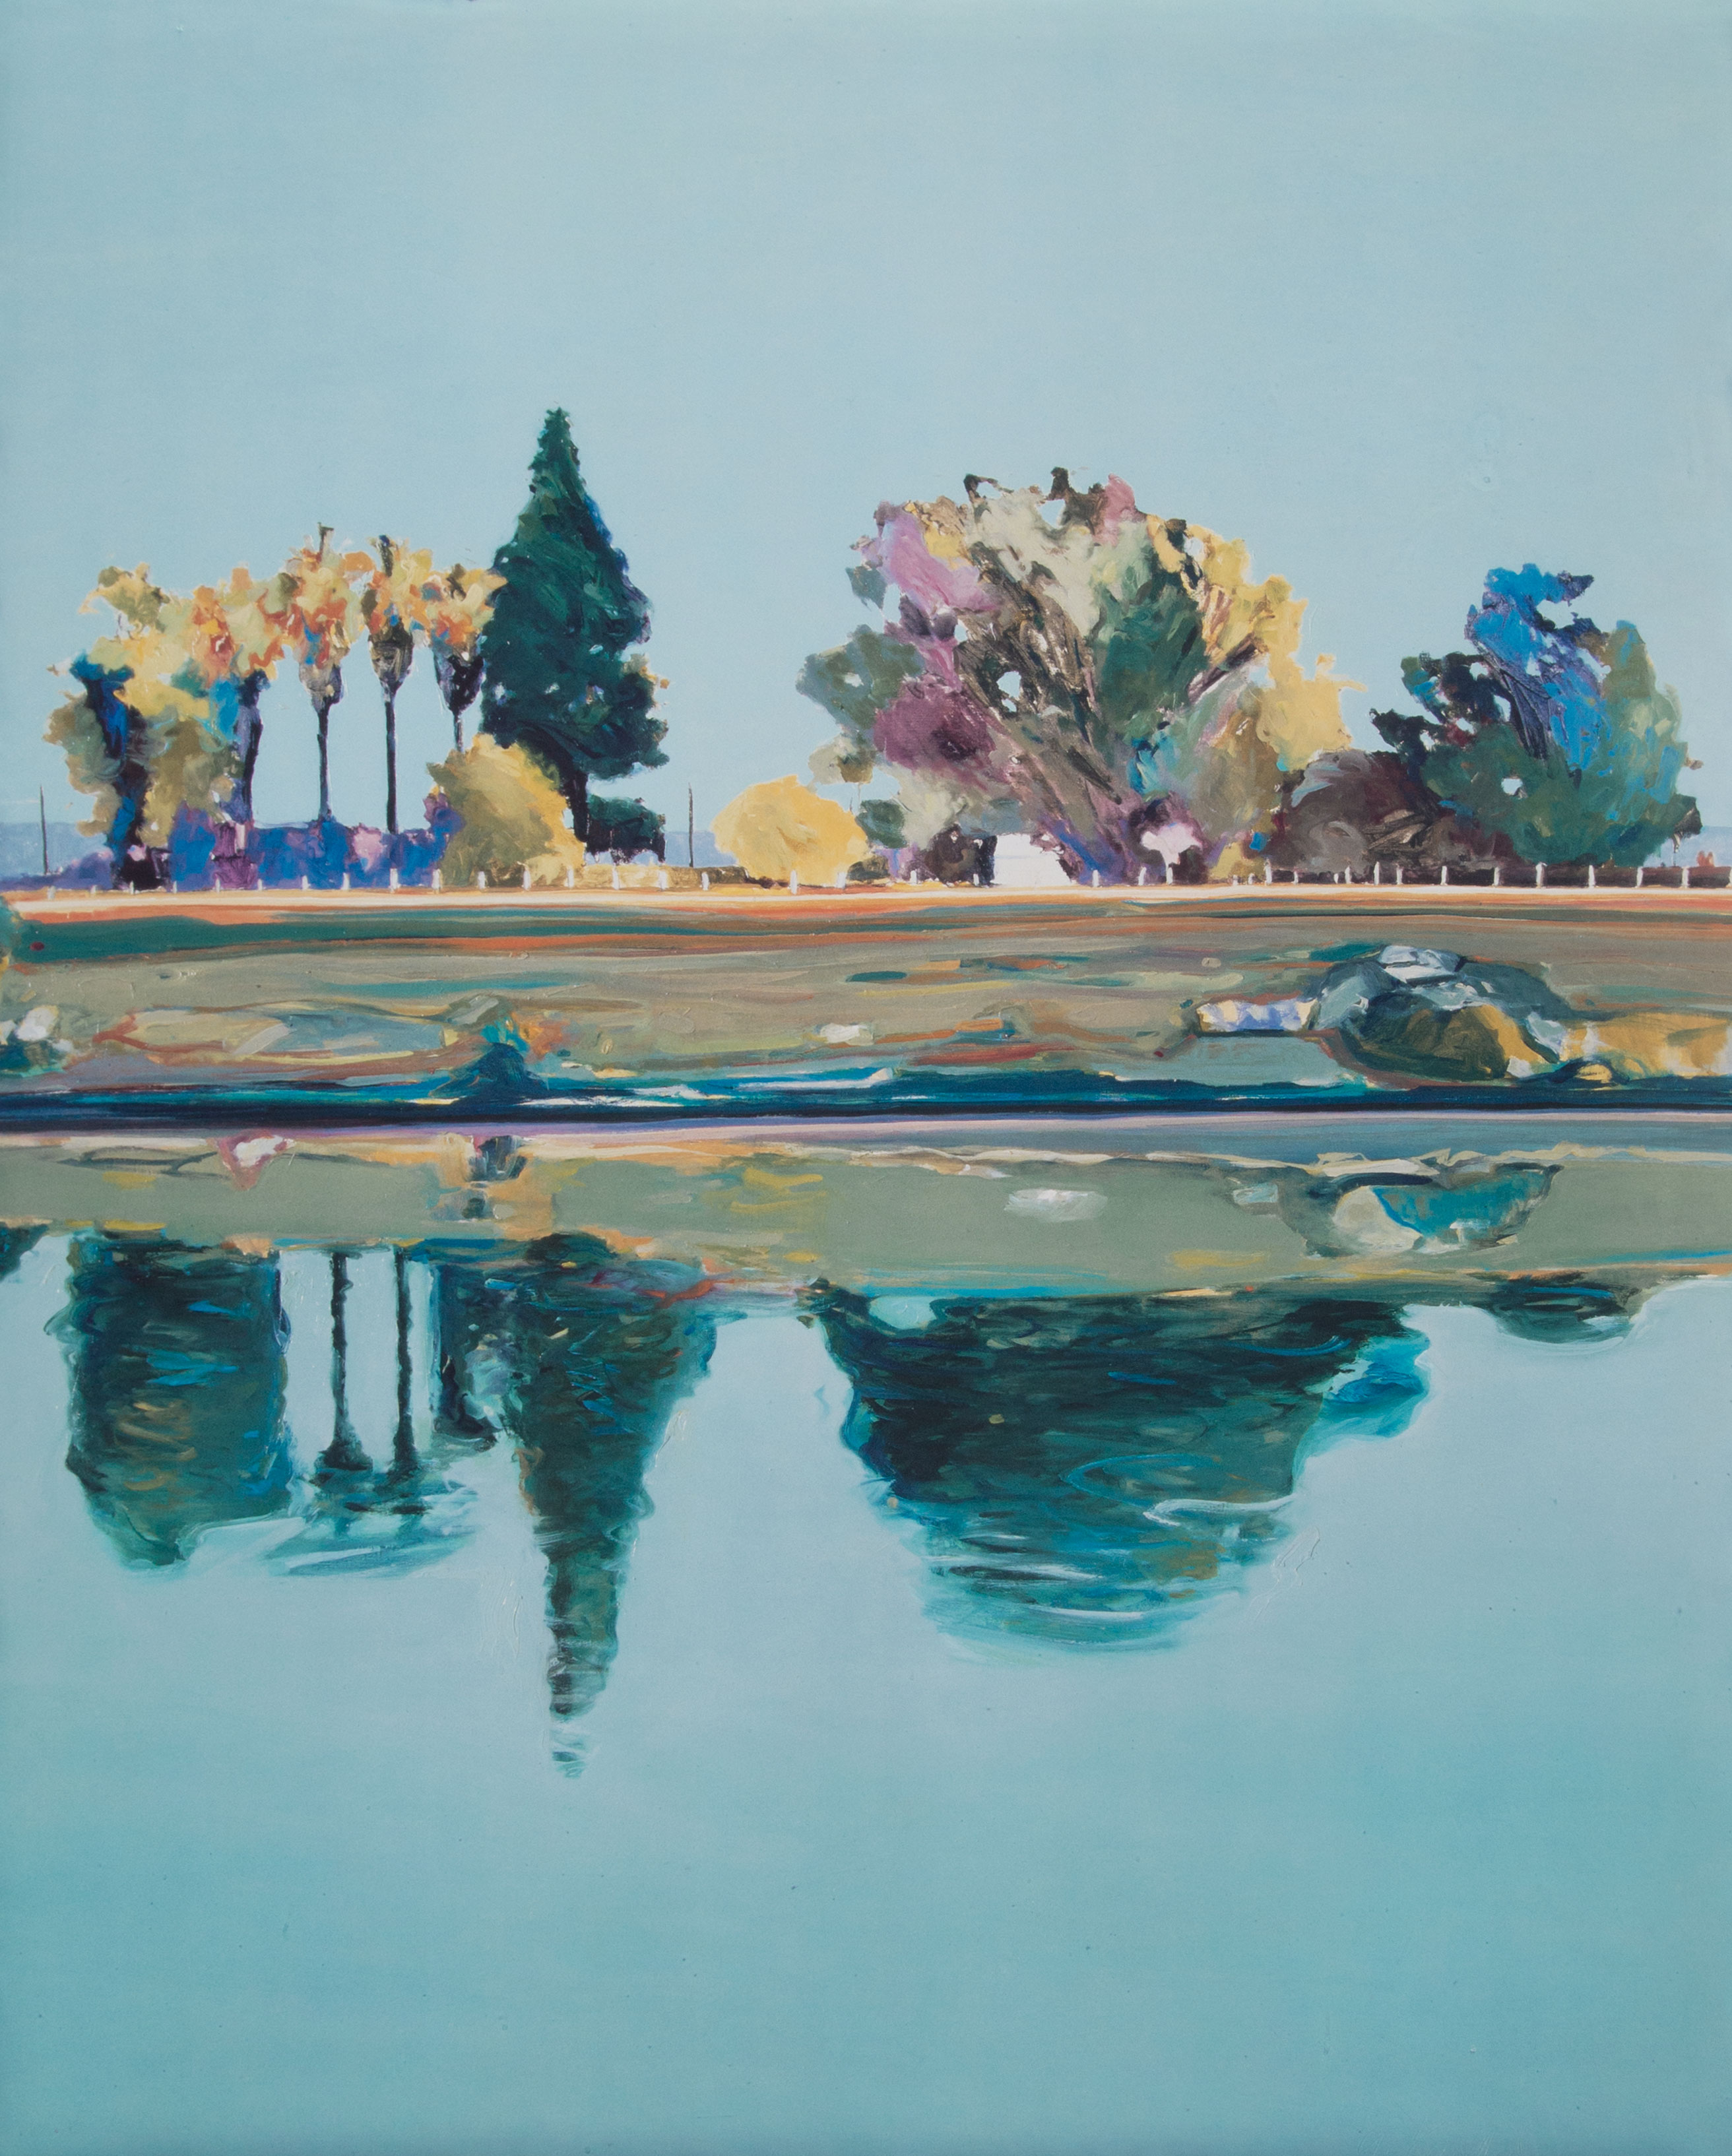 Gregory Kondos, River Palms, 1999